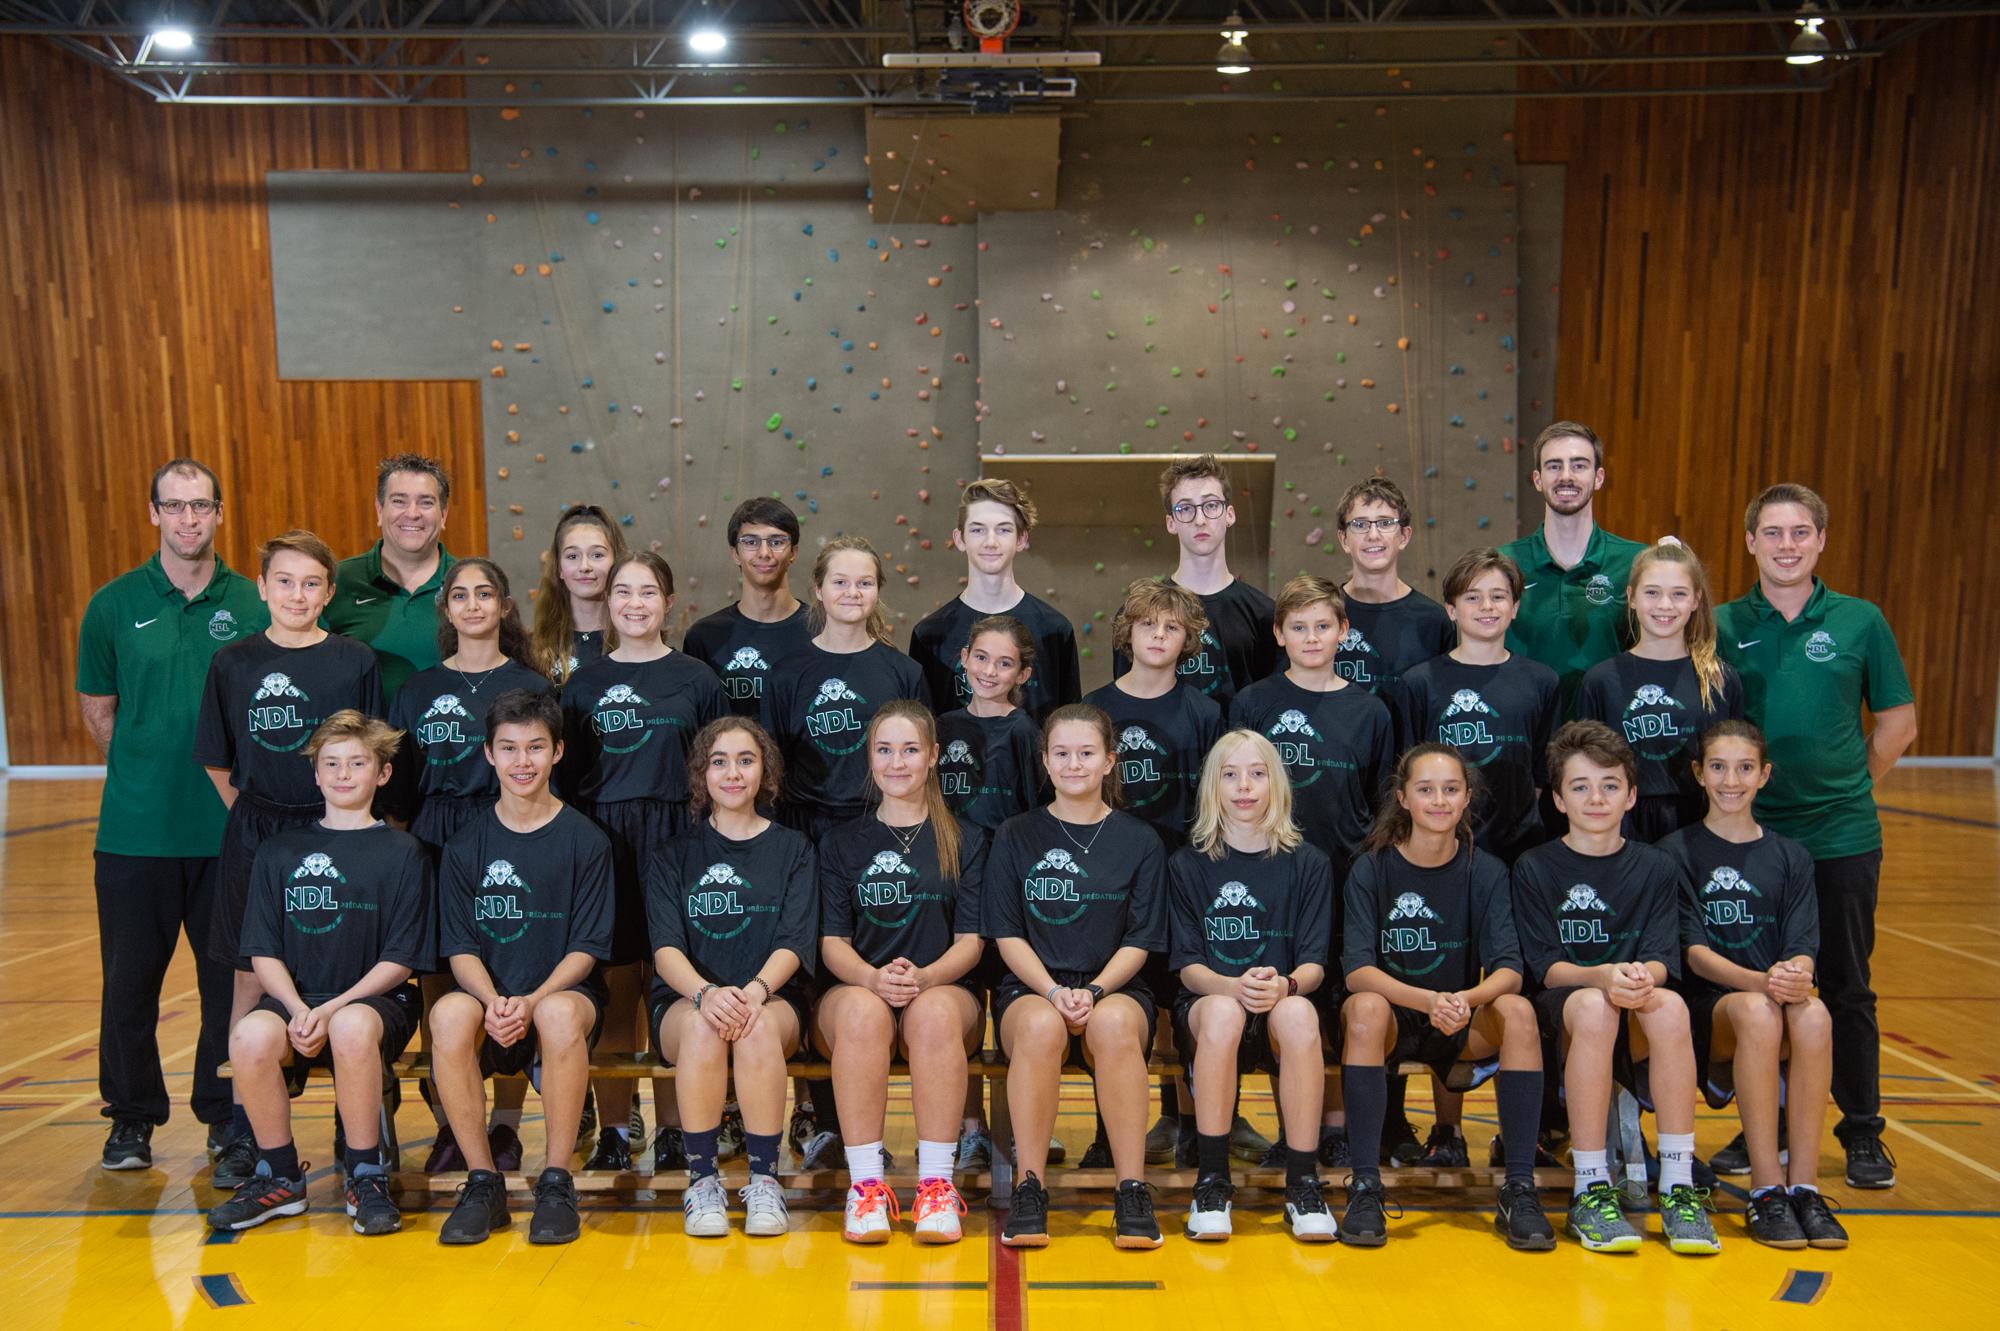 NDL_Preds 2019-2020 Badminton